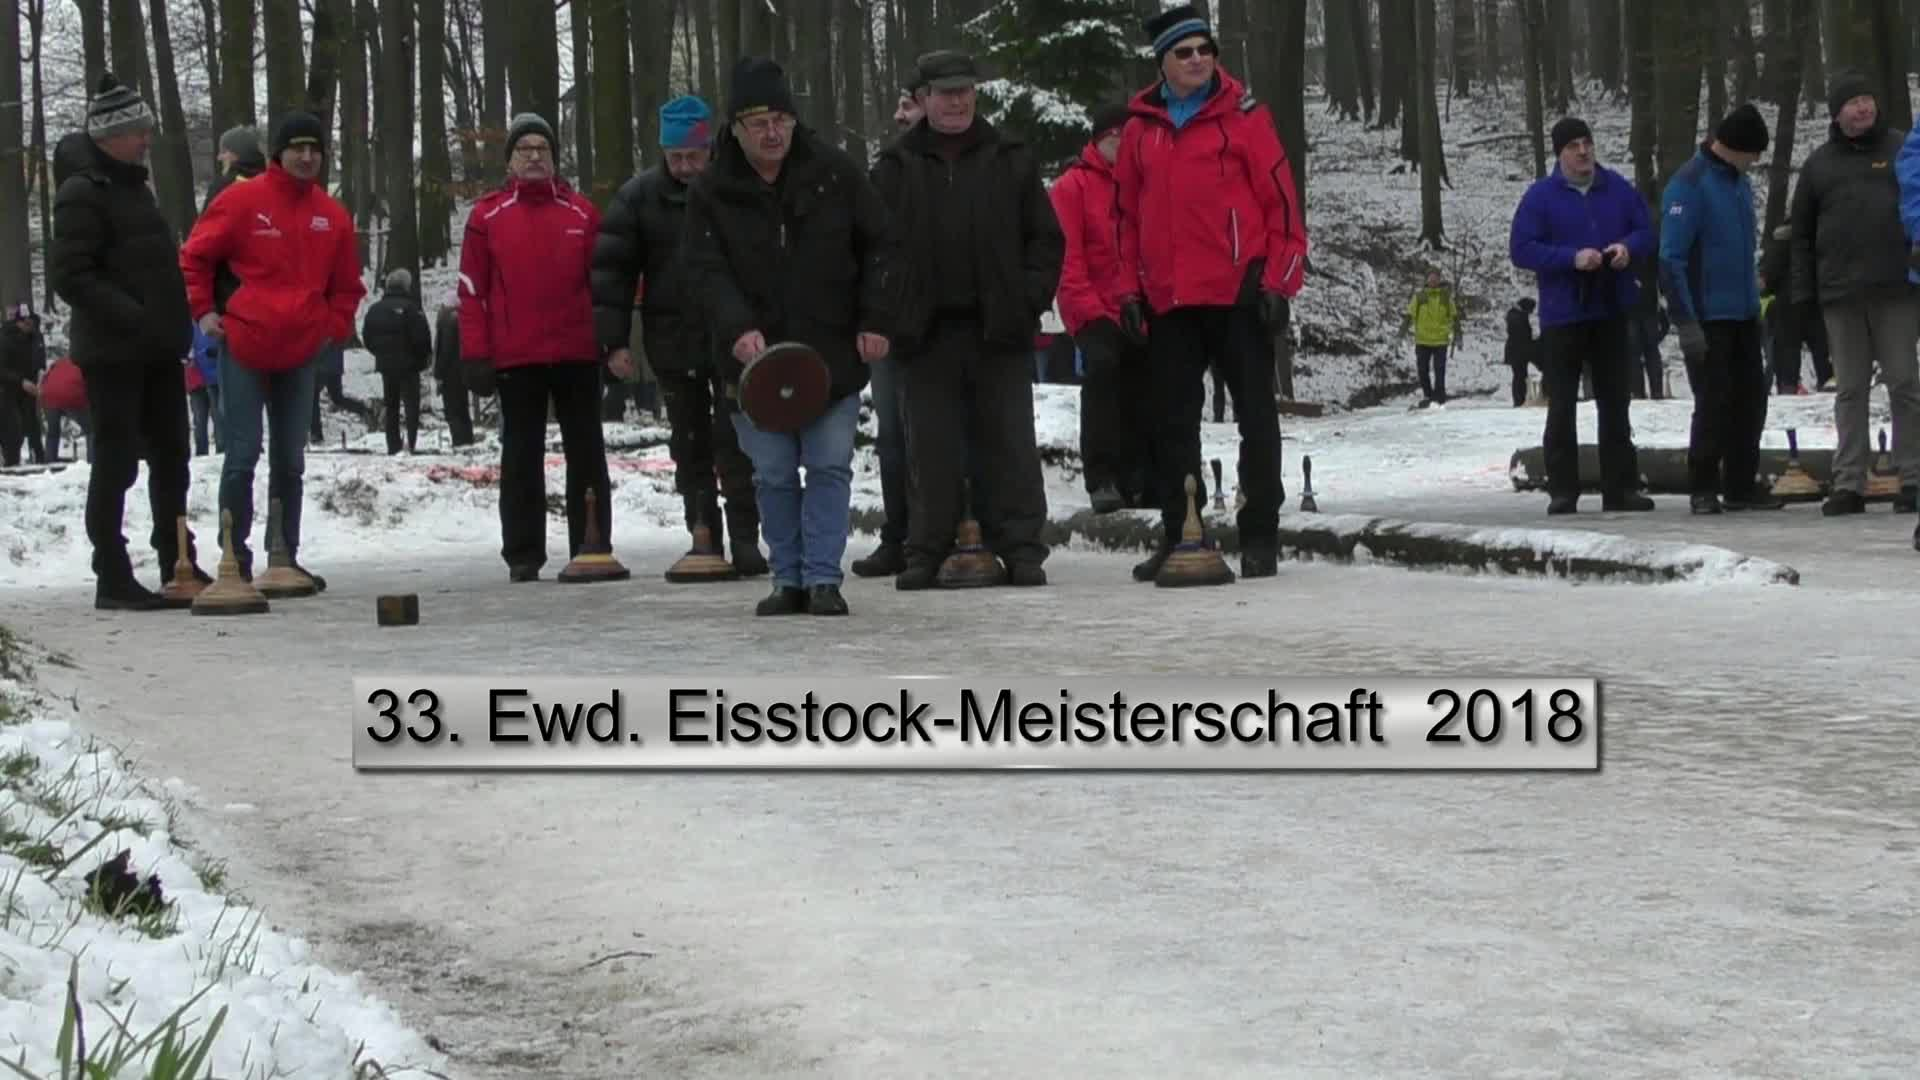 33. Engerwitzdorfer Eisstock-Meisterschaft 2018